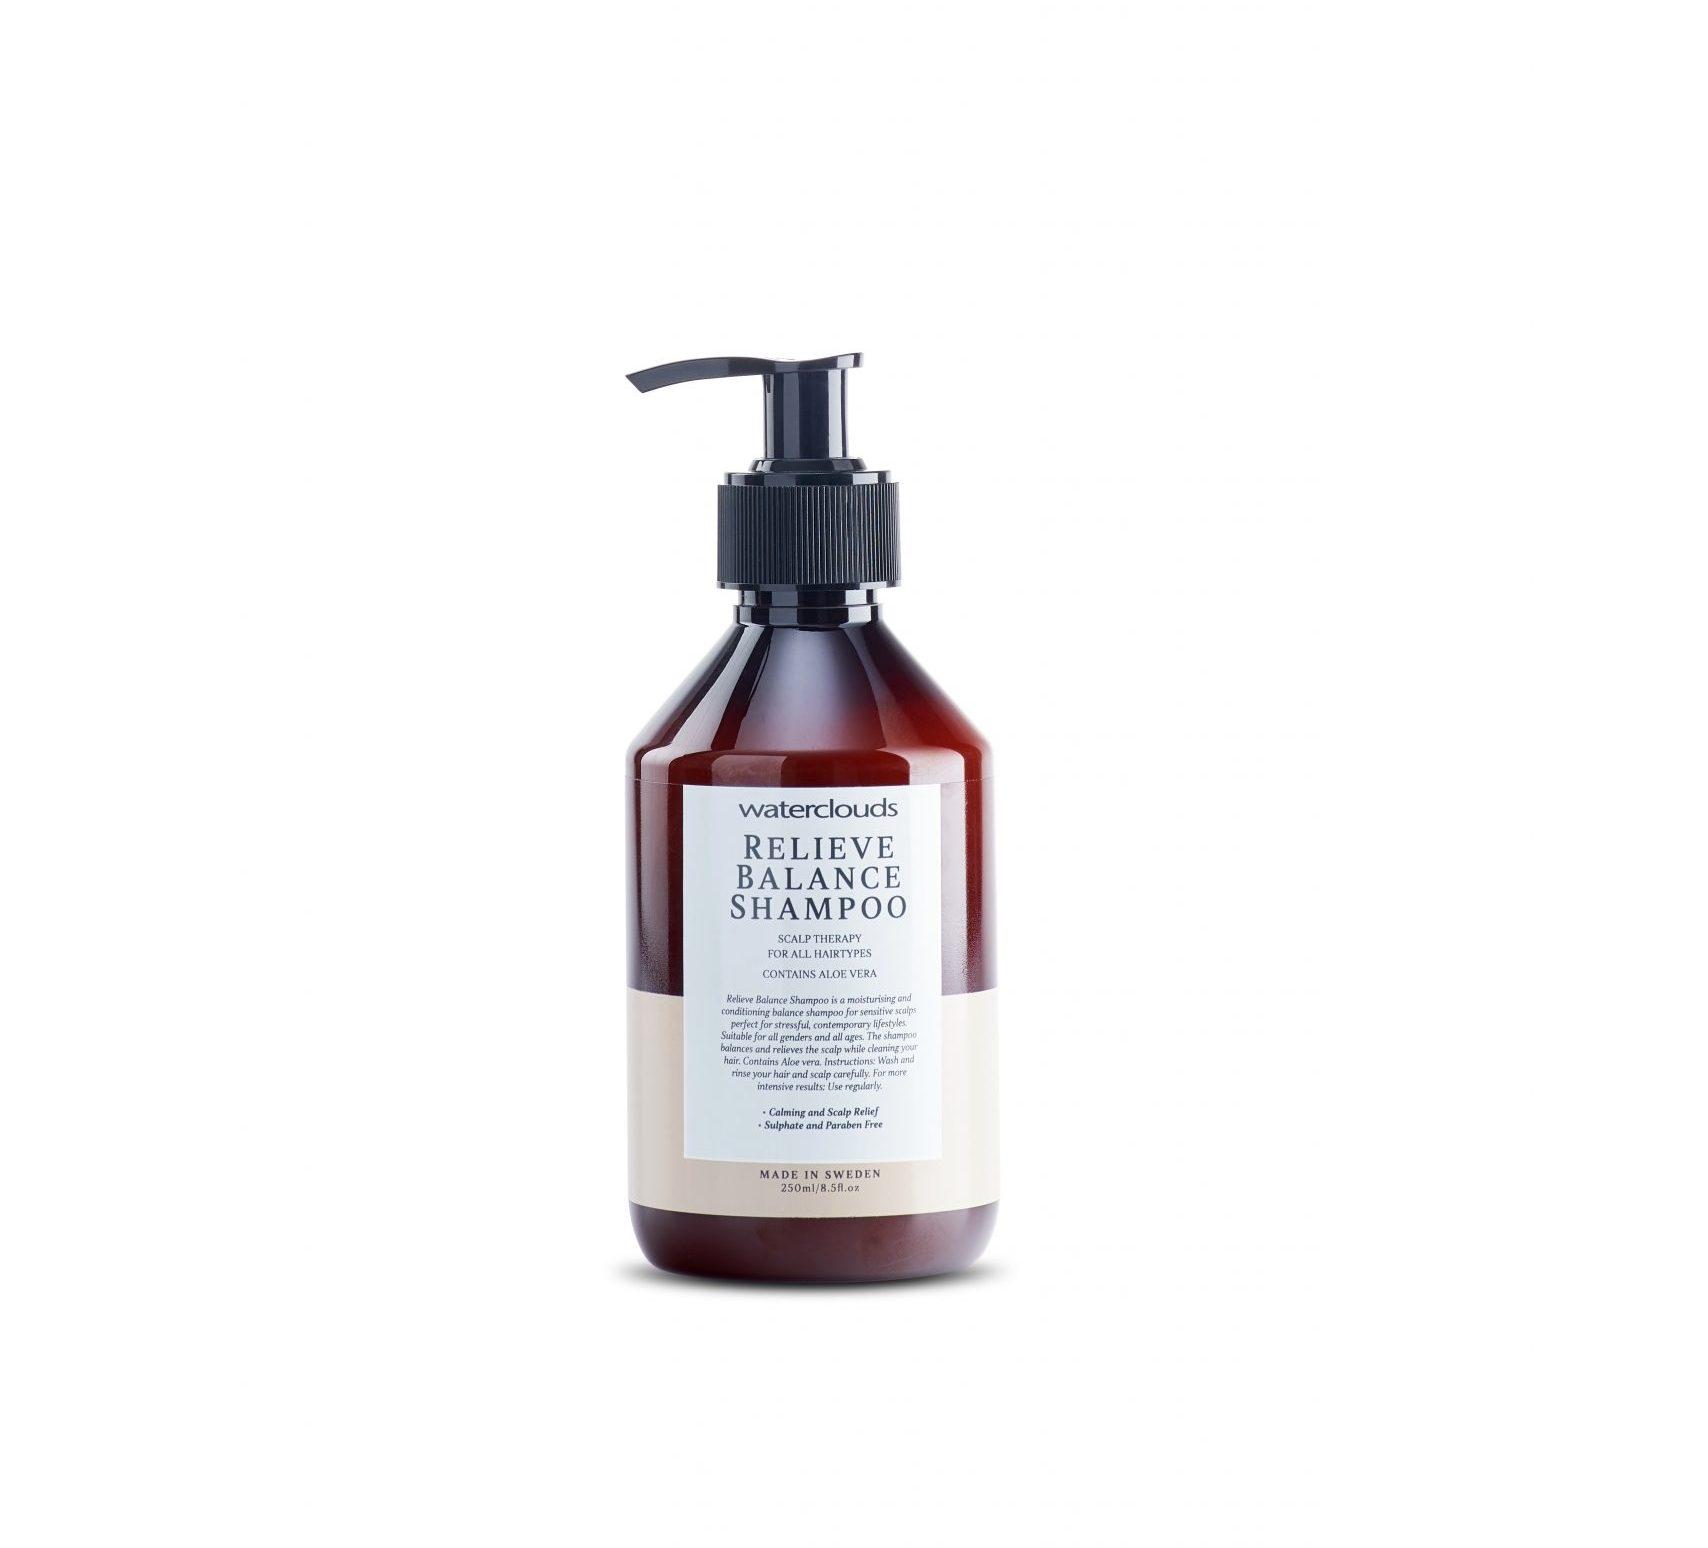 Relieve Balance Shampoo 250ml – Waterclouds Relieve